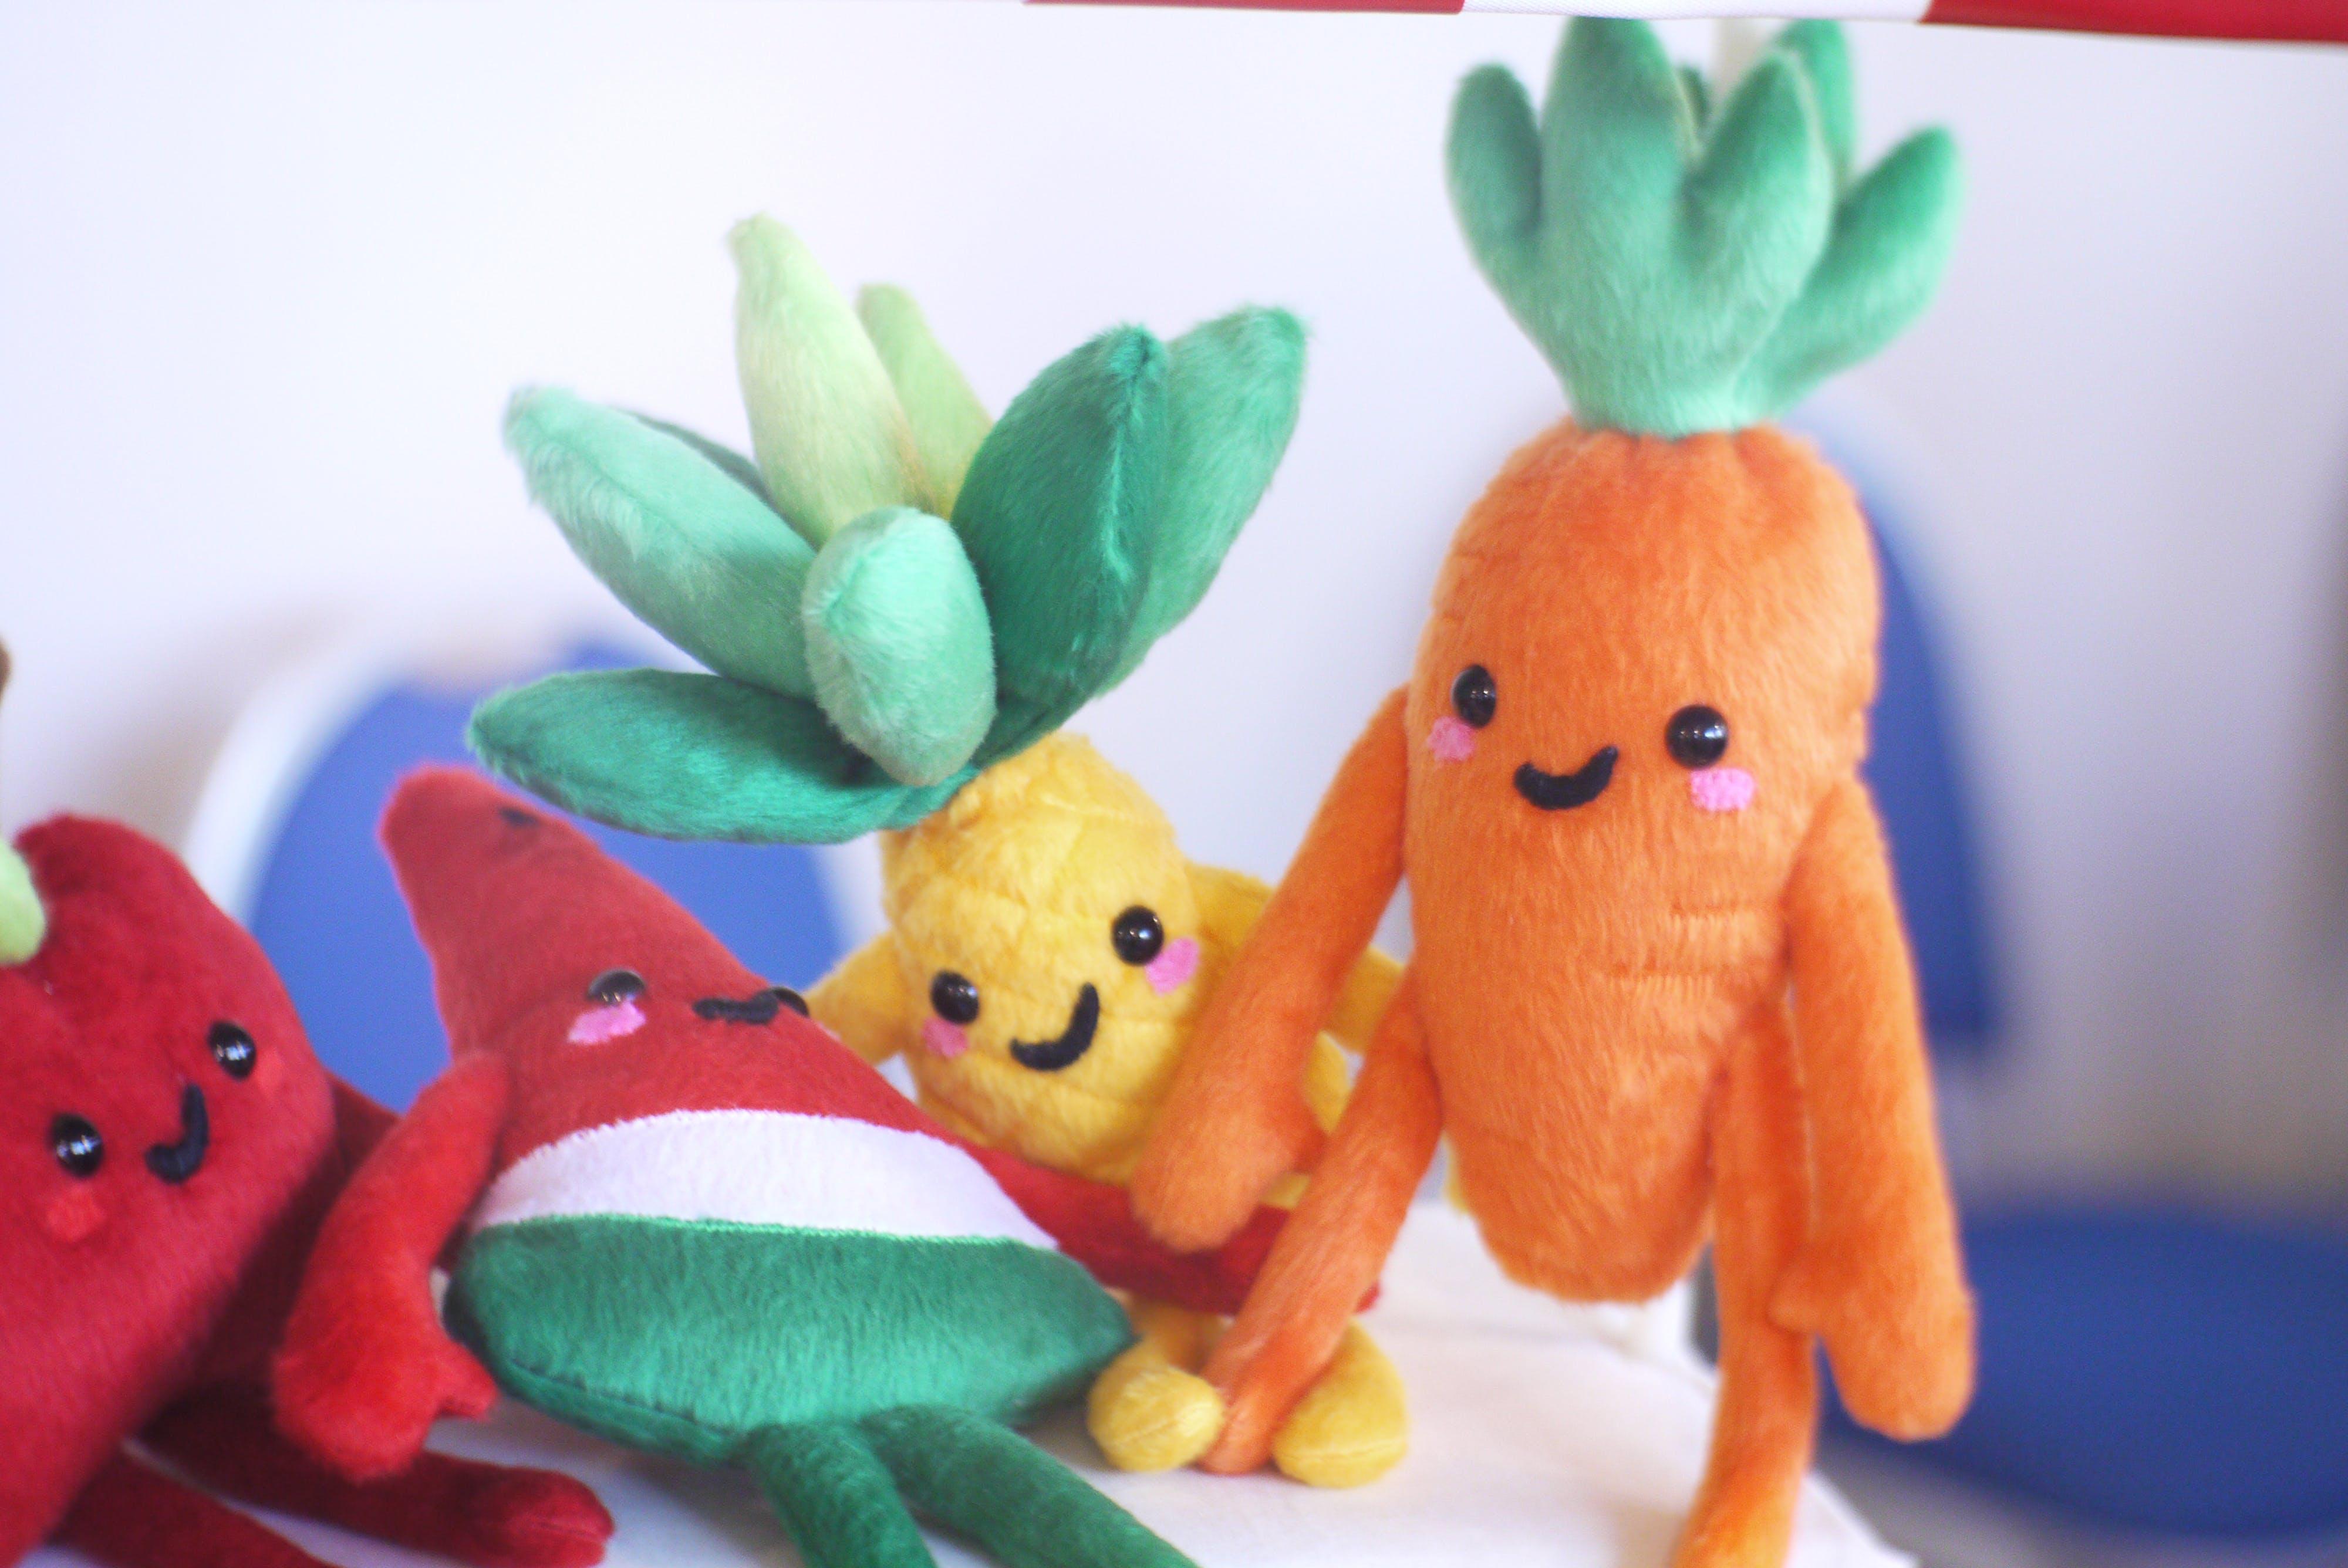 Free stock photo of baby toy, children, children toys, fruit